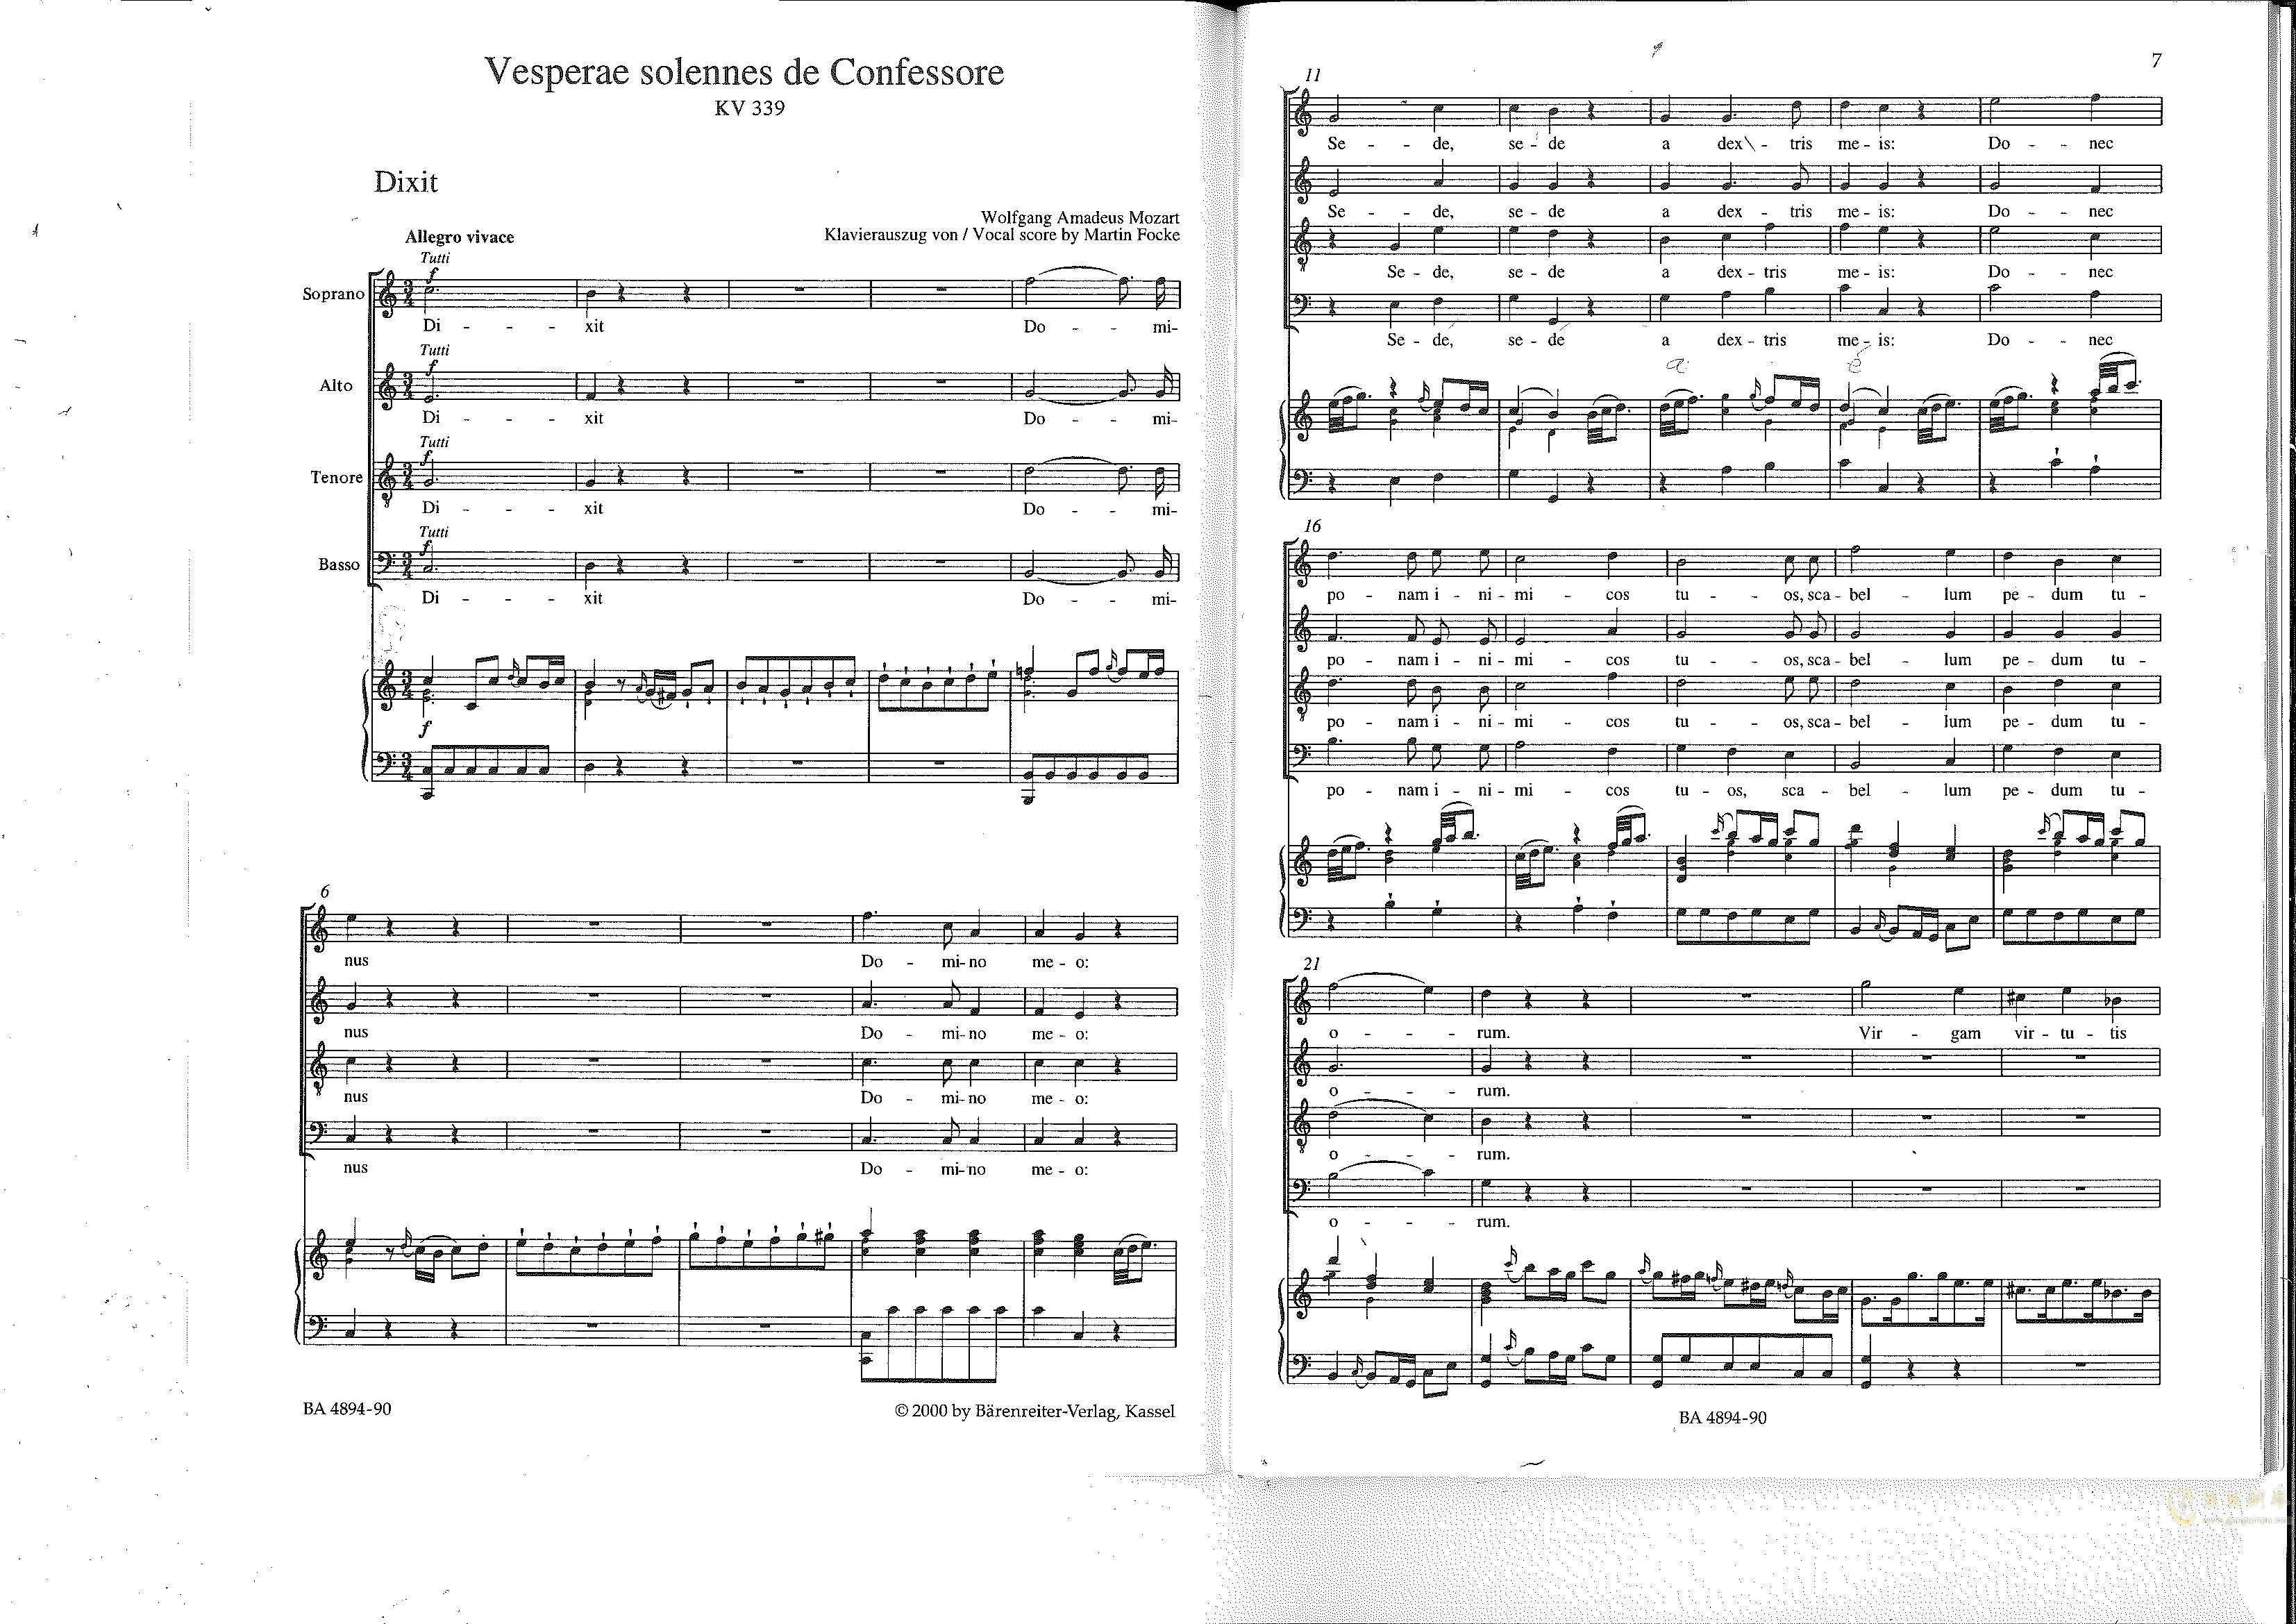 Vesperae solennes de confessore K. 339钢琴谱 第4页